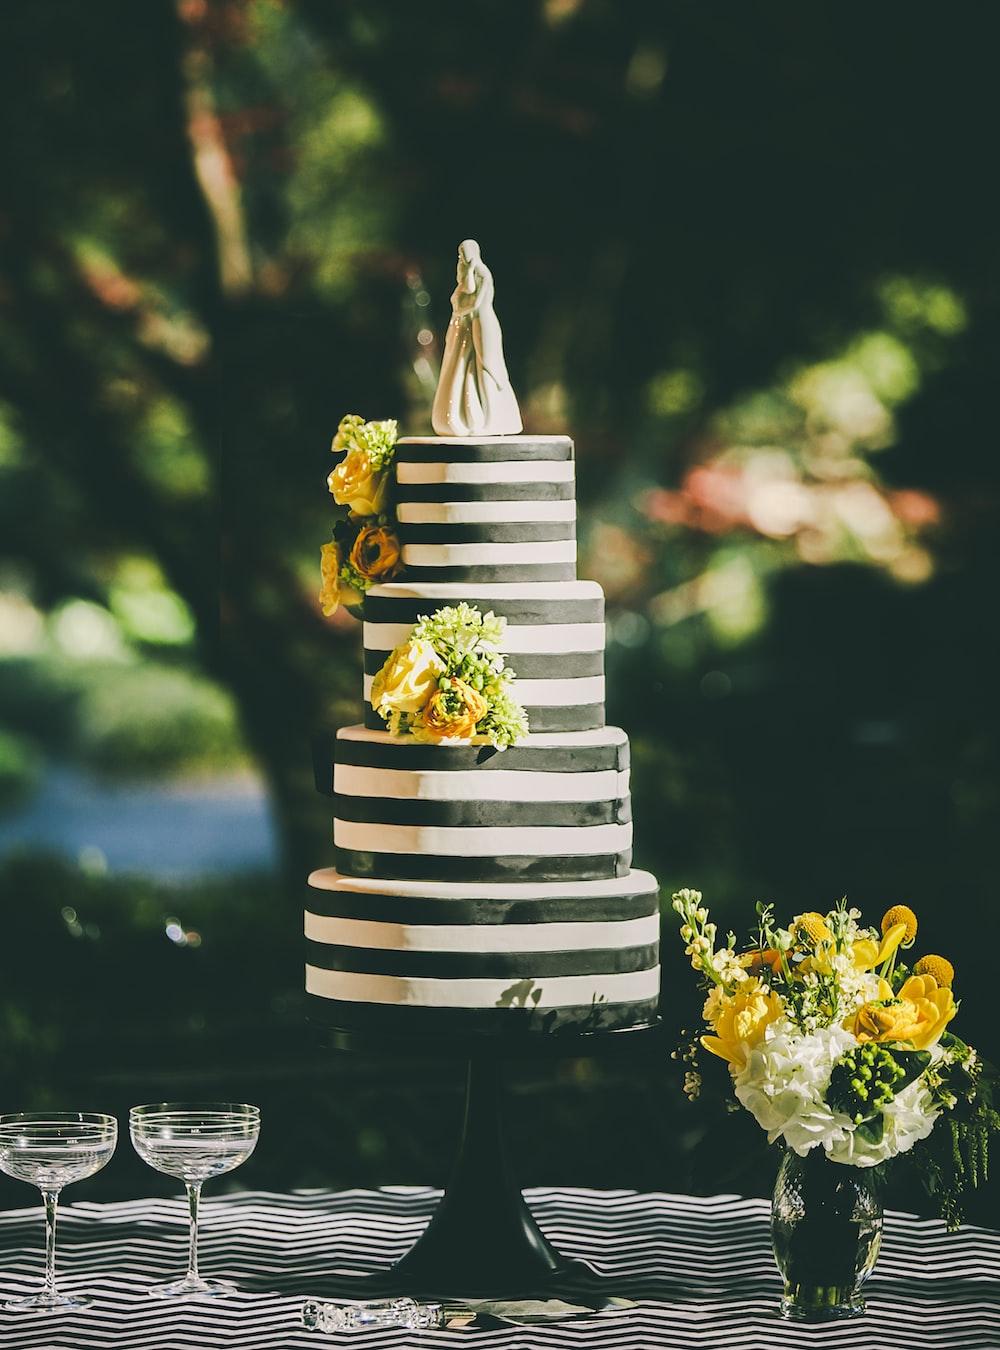 round 4-layered cake on black tray